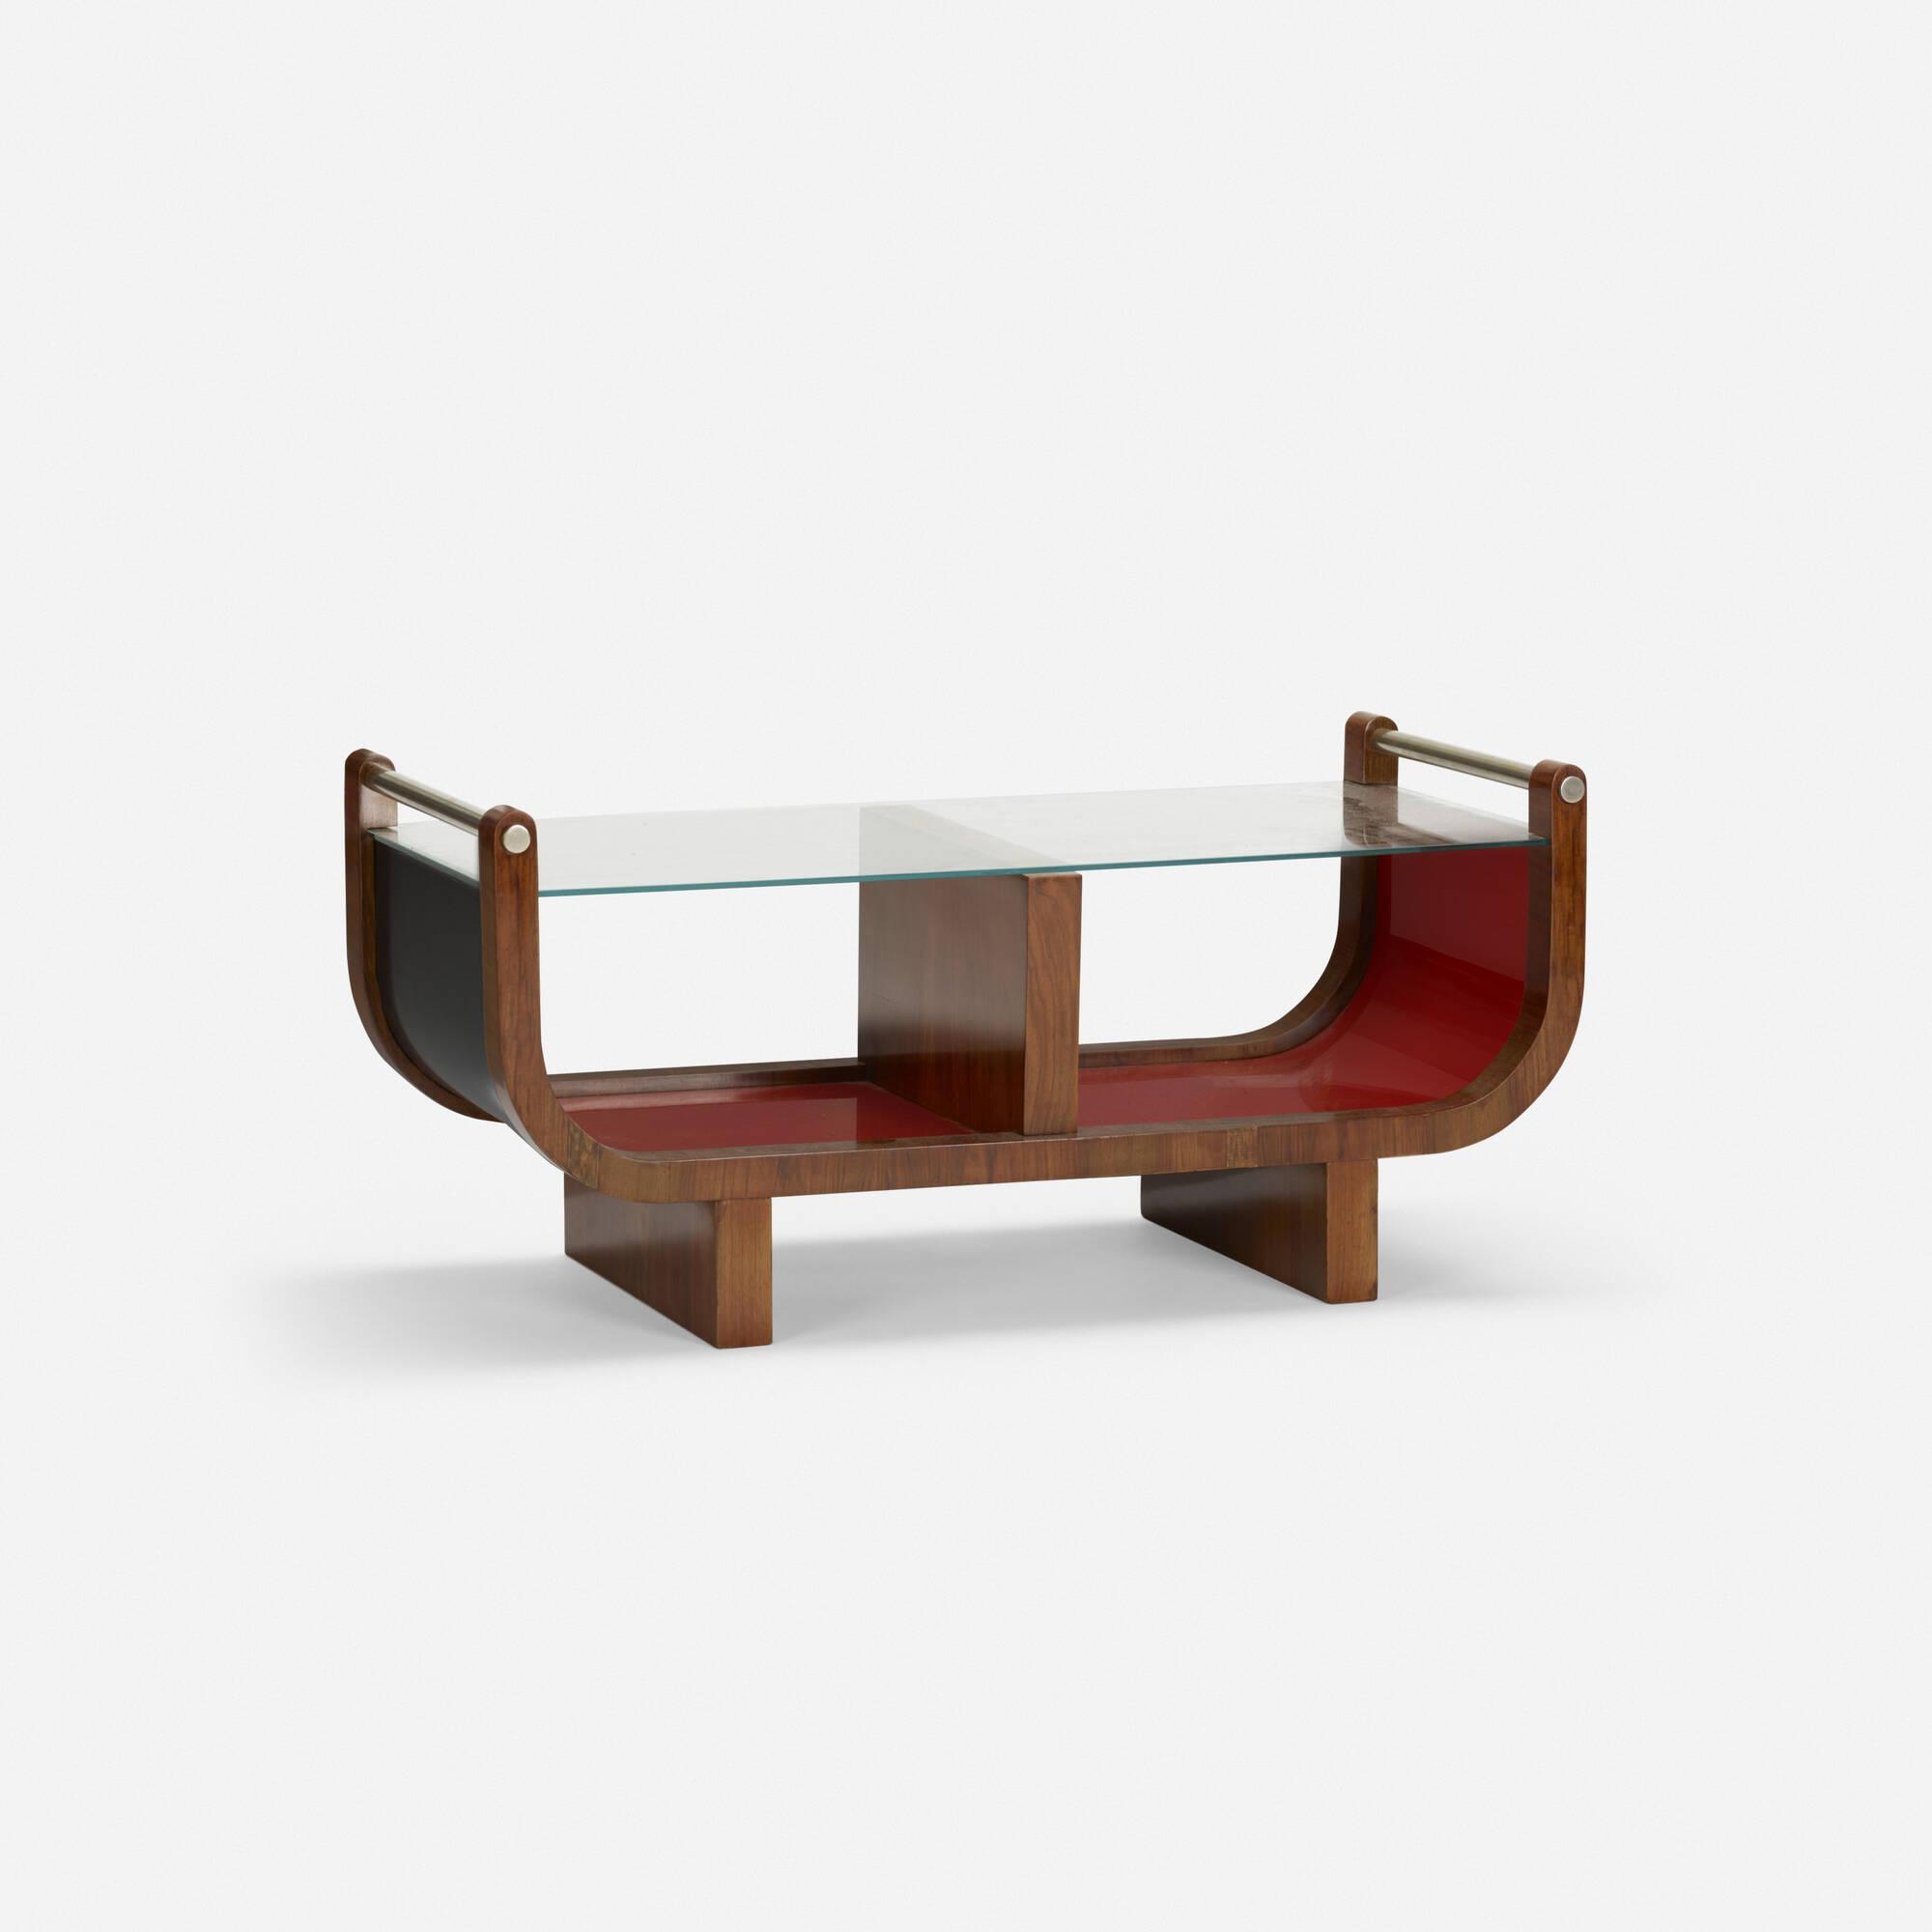 167 Gio Ponti coffee table Design 14 December 2017